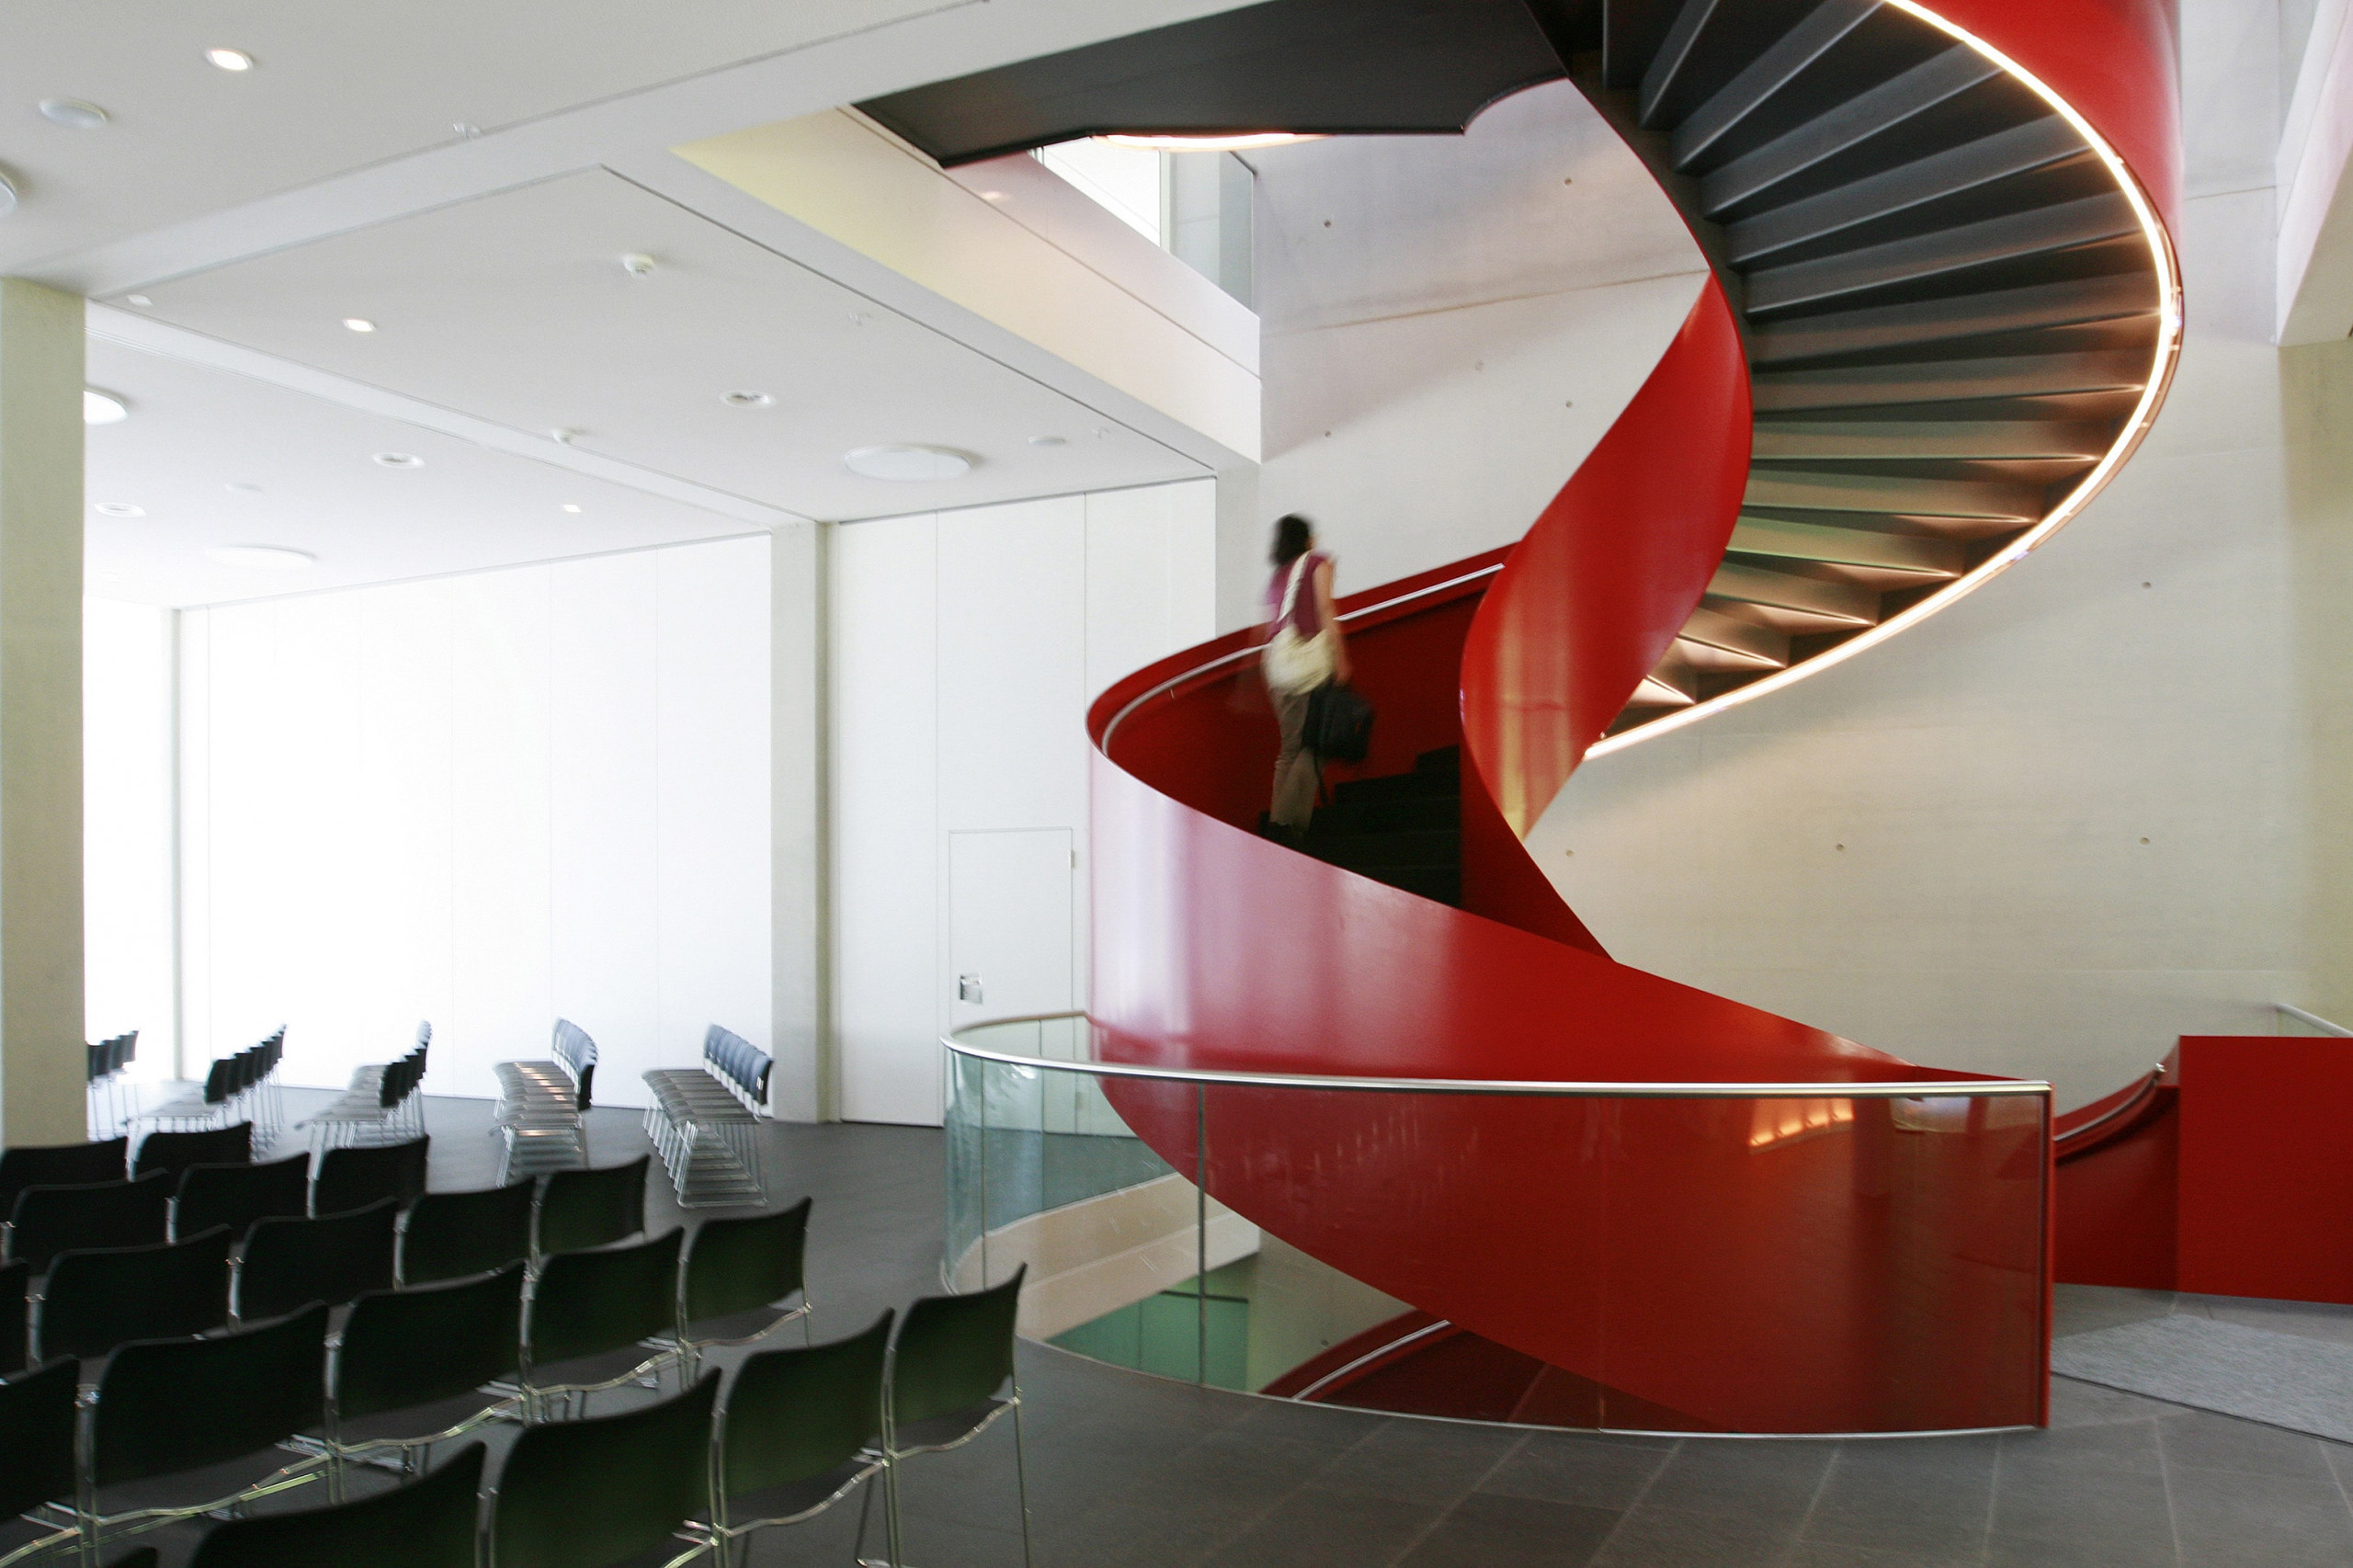 rote Wendeltreppe, Zeppelin Universität